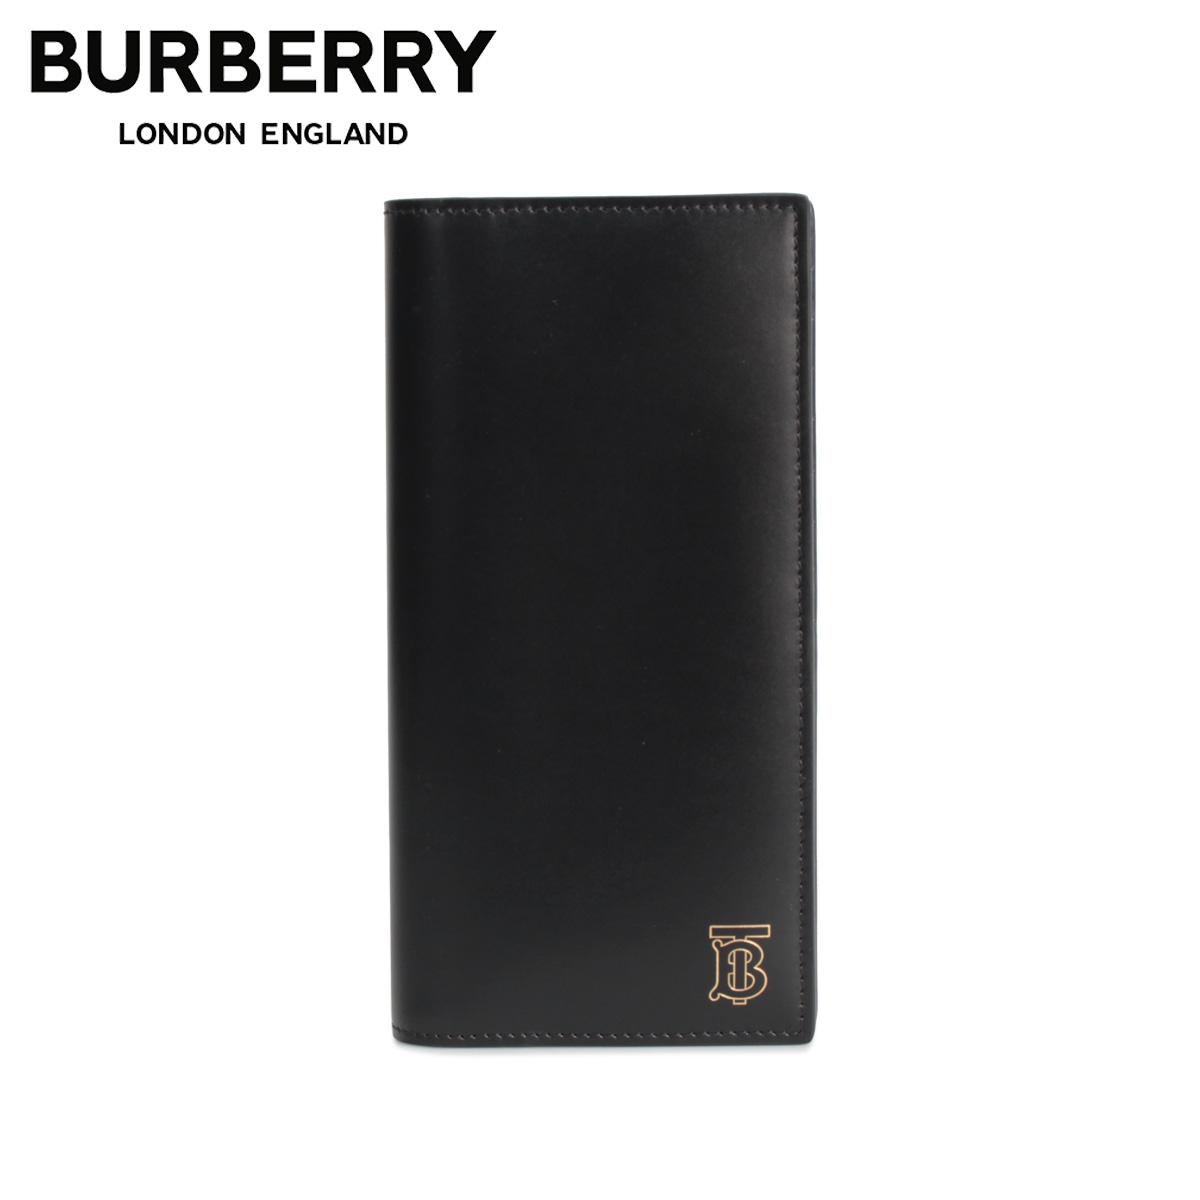 BURBERRY バーバリー 財布 長財布 メンズ CAVENDISH TB TAILORING LEATHER WALLET ブラック 黒 8009190